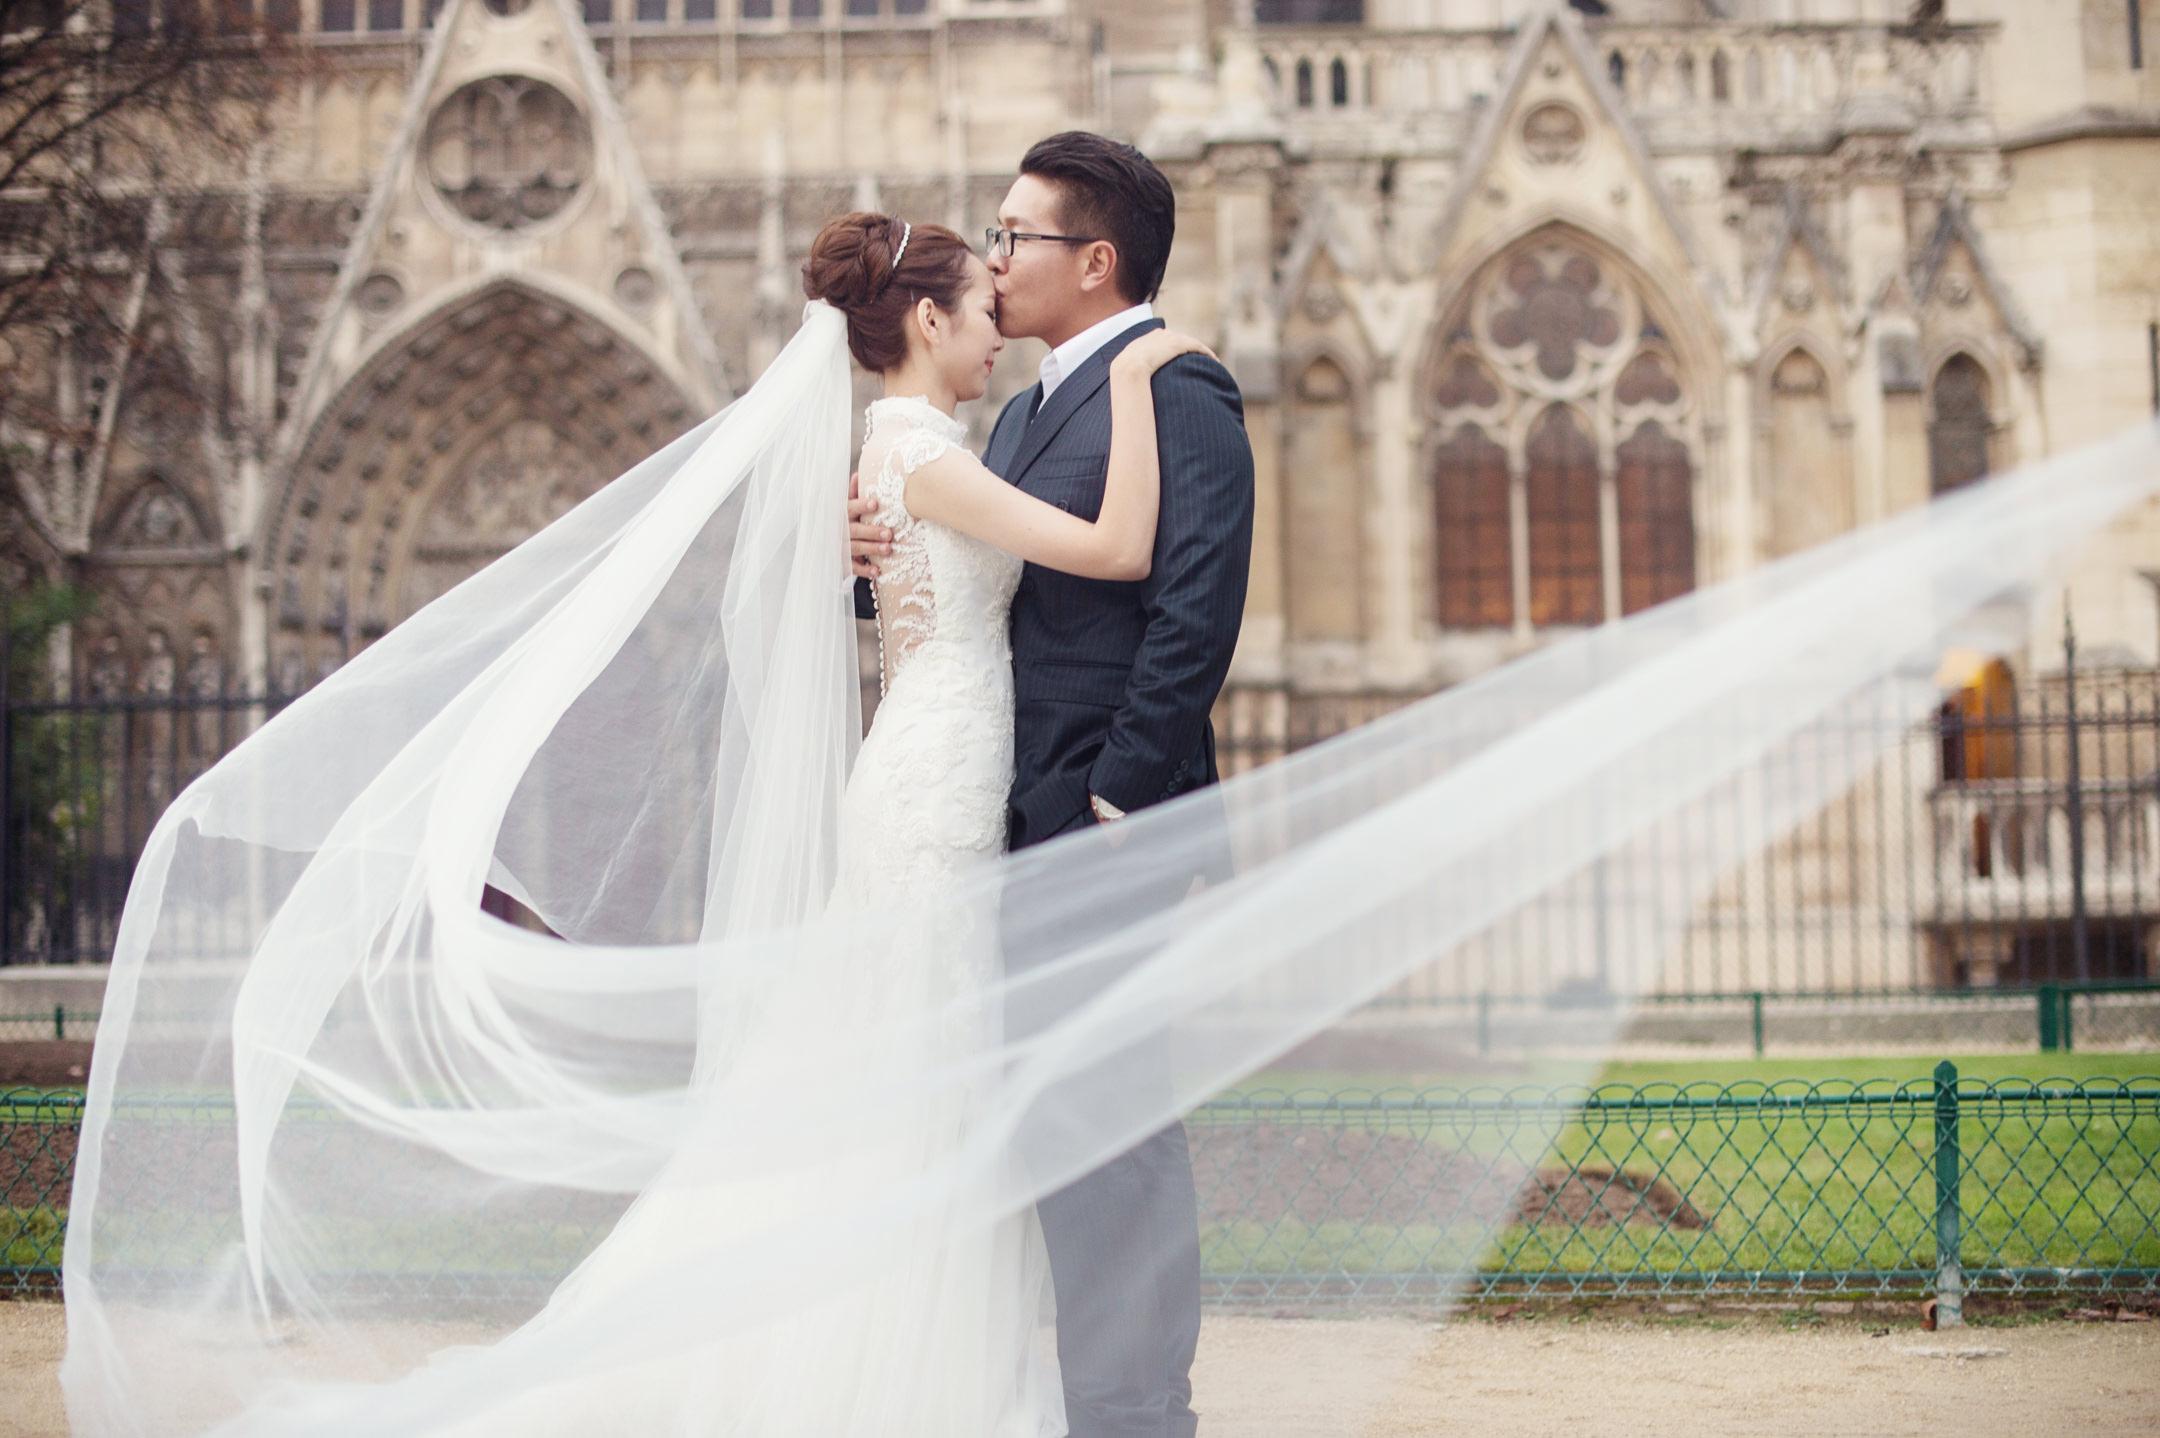 Chris_Hui_Paris_Prewedding_Photography210.jpg